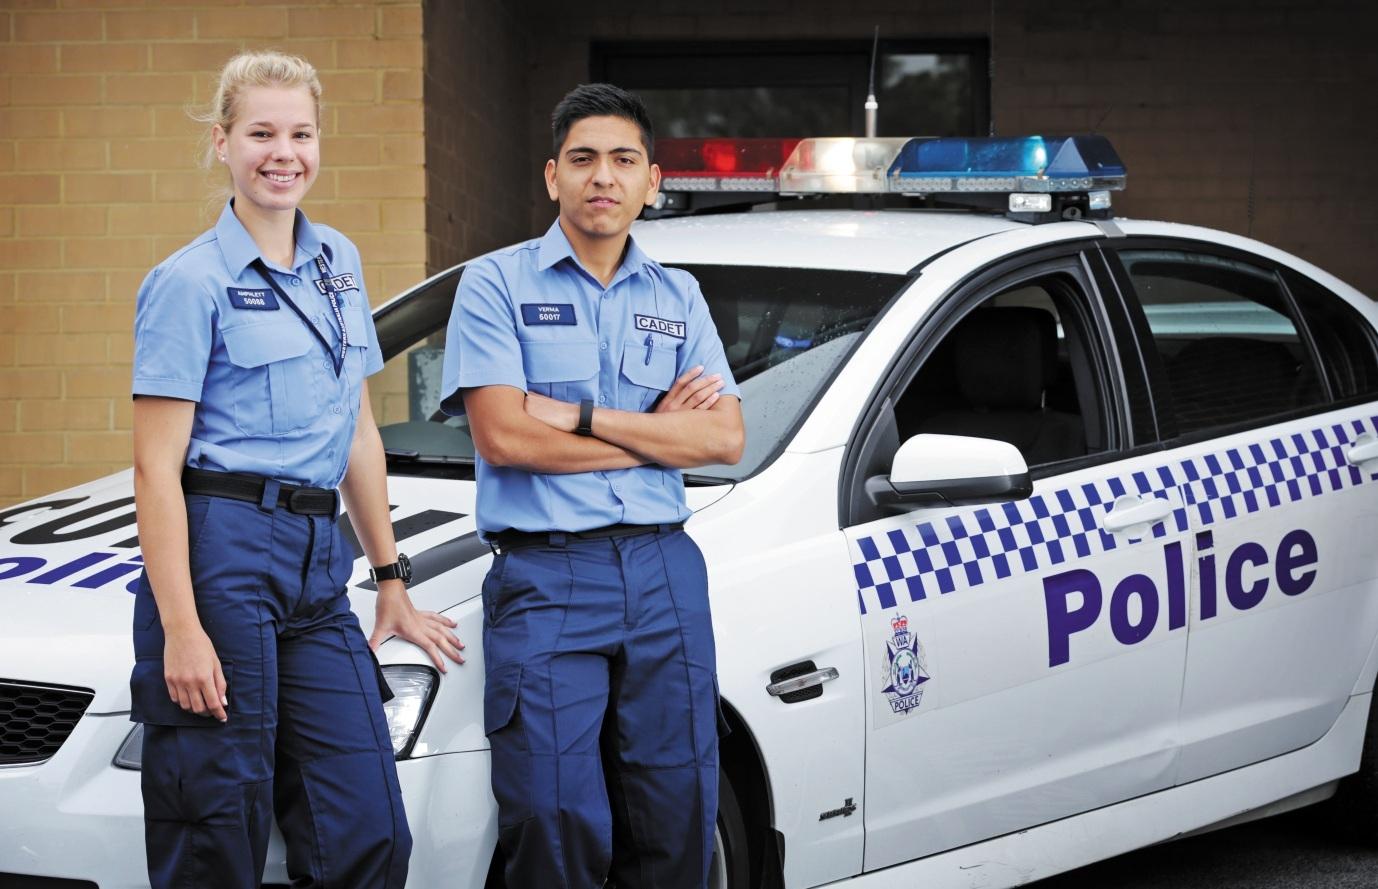 Police cadets Nikki Amphlett and Akash Verma at Kensington Police Station. Picture: David Baylis d436077